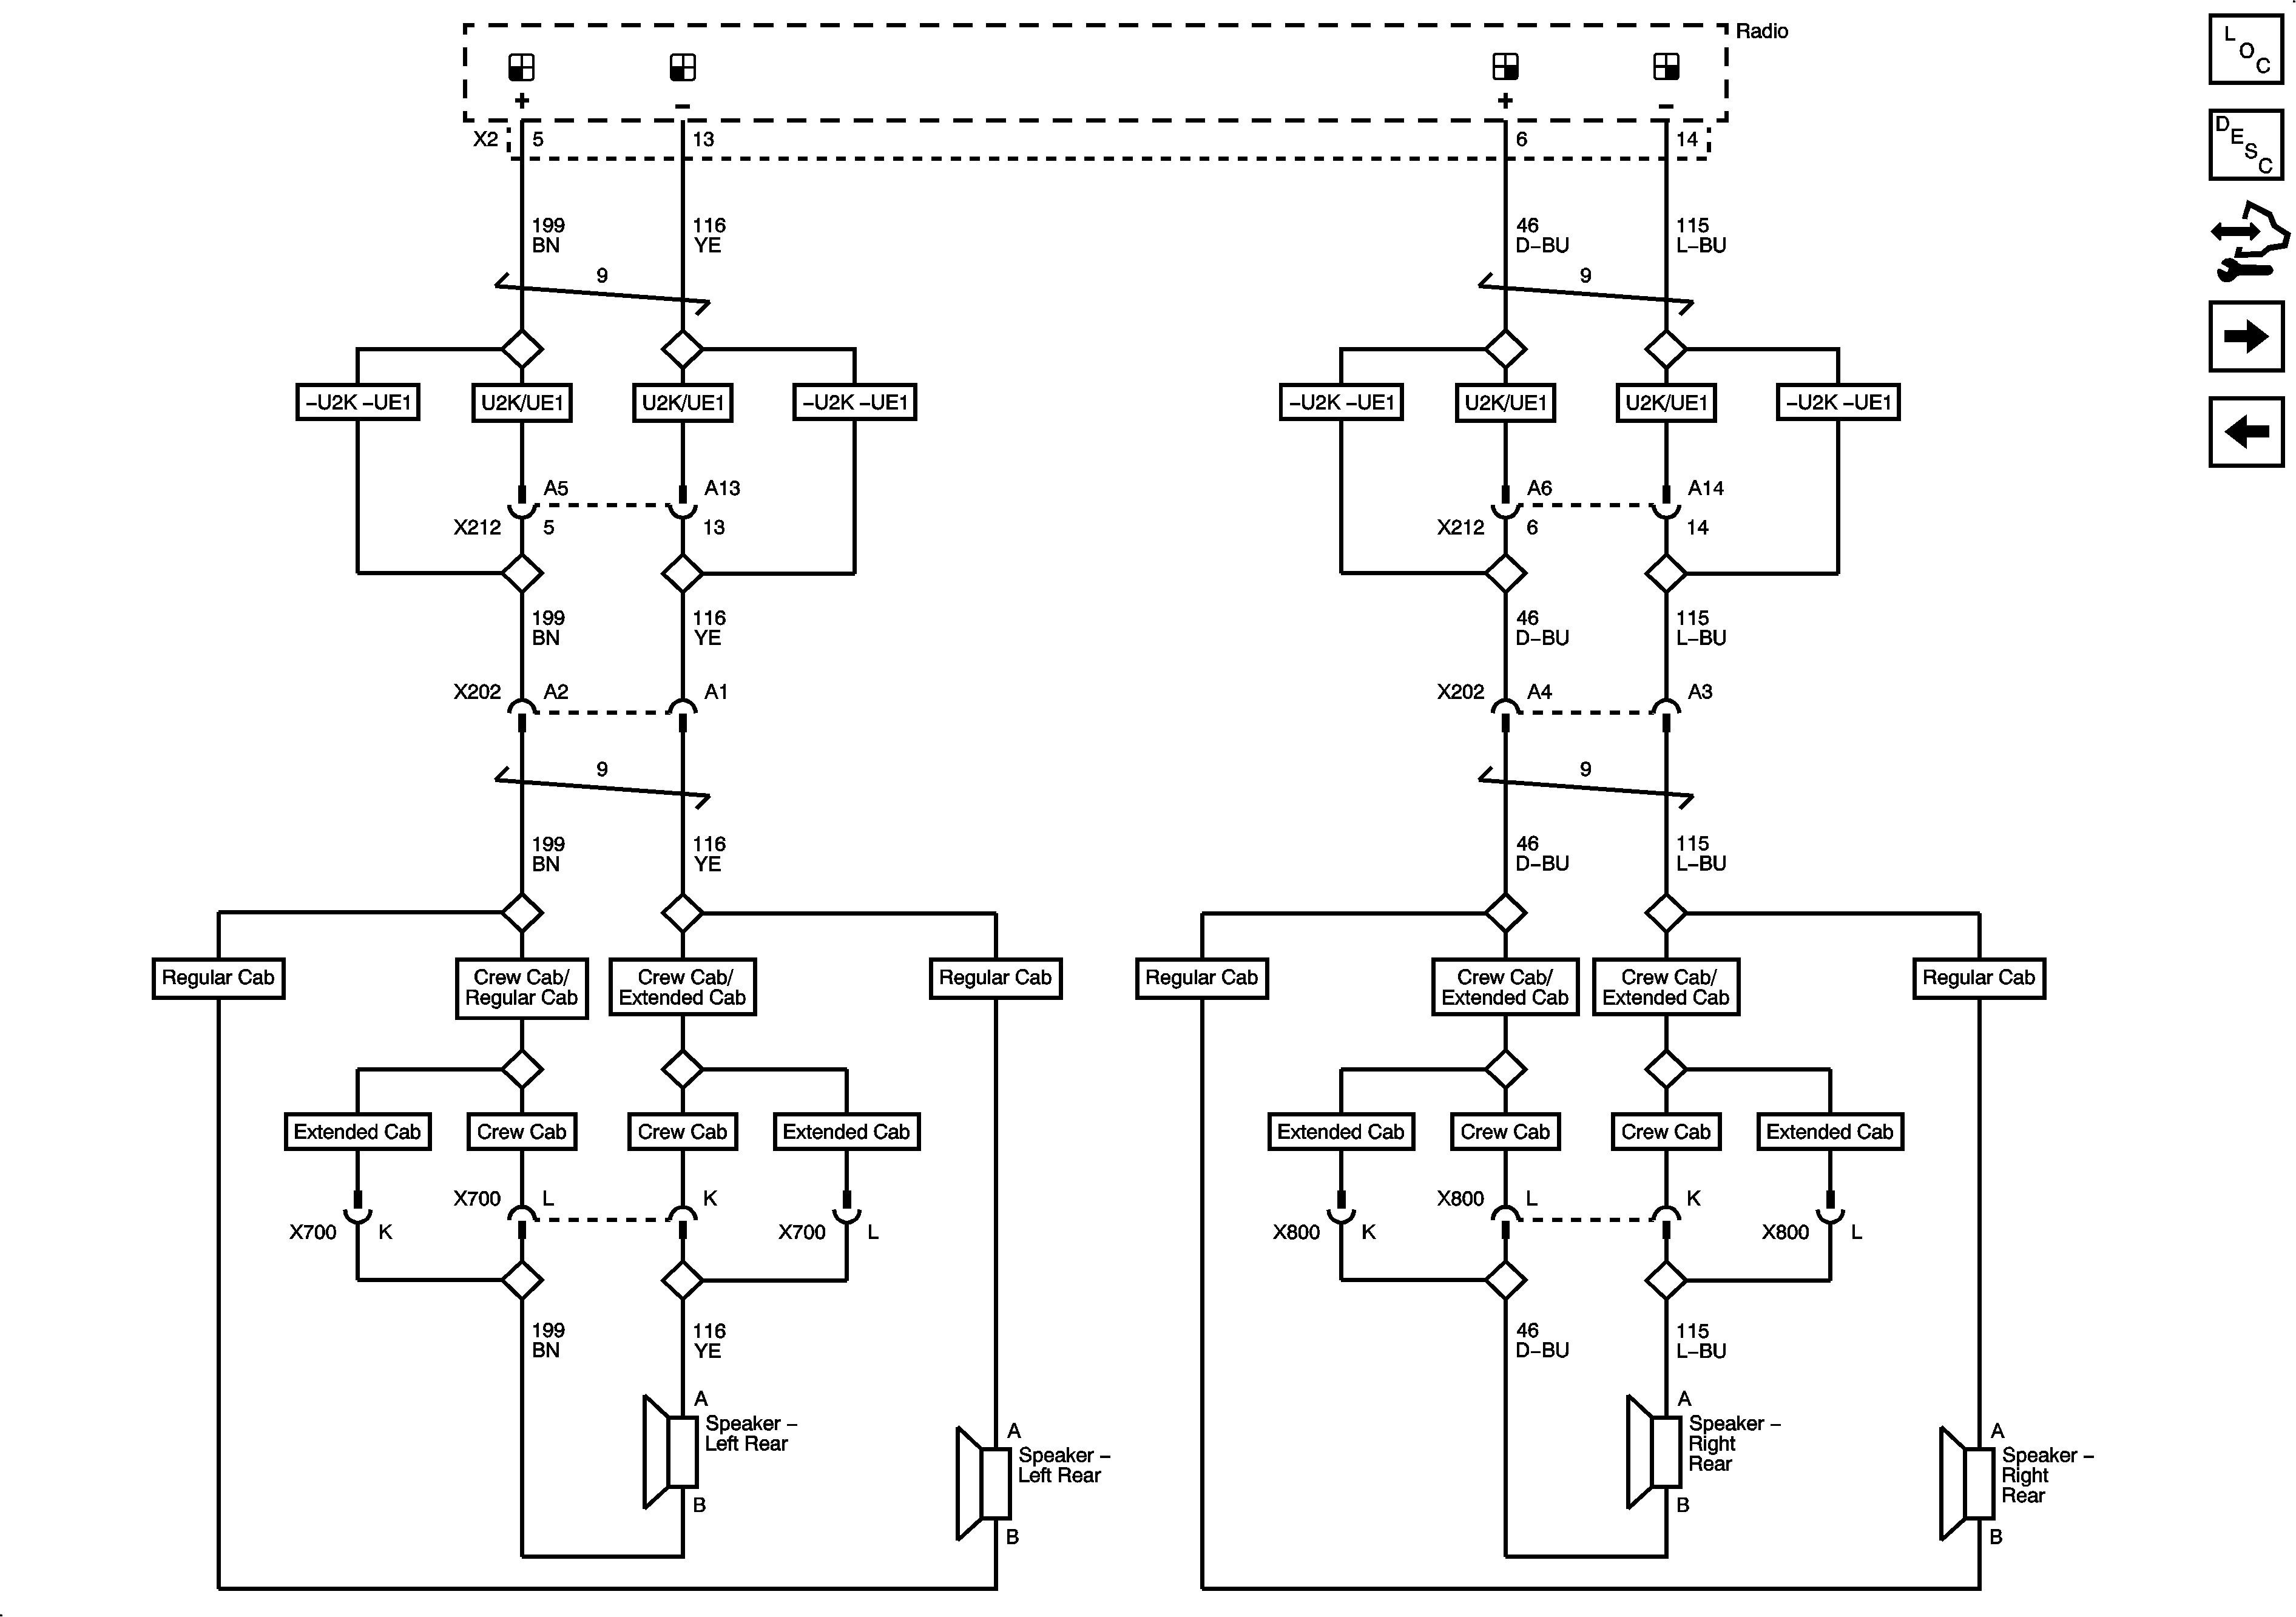 2002 Monte Carlo Wiring Diagram. Engine. Wiring Diagram Images